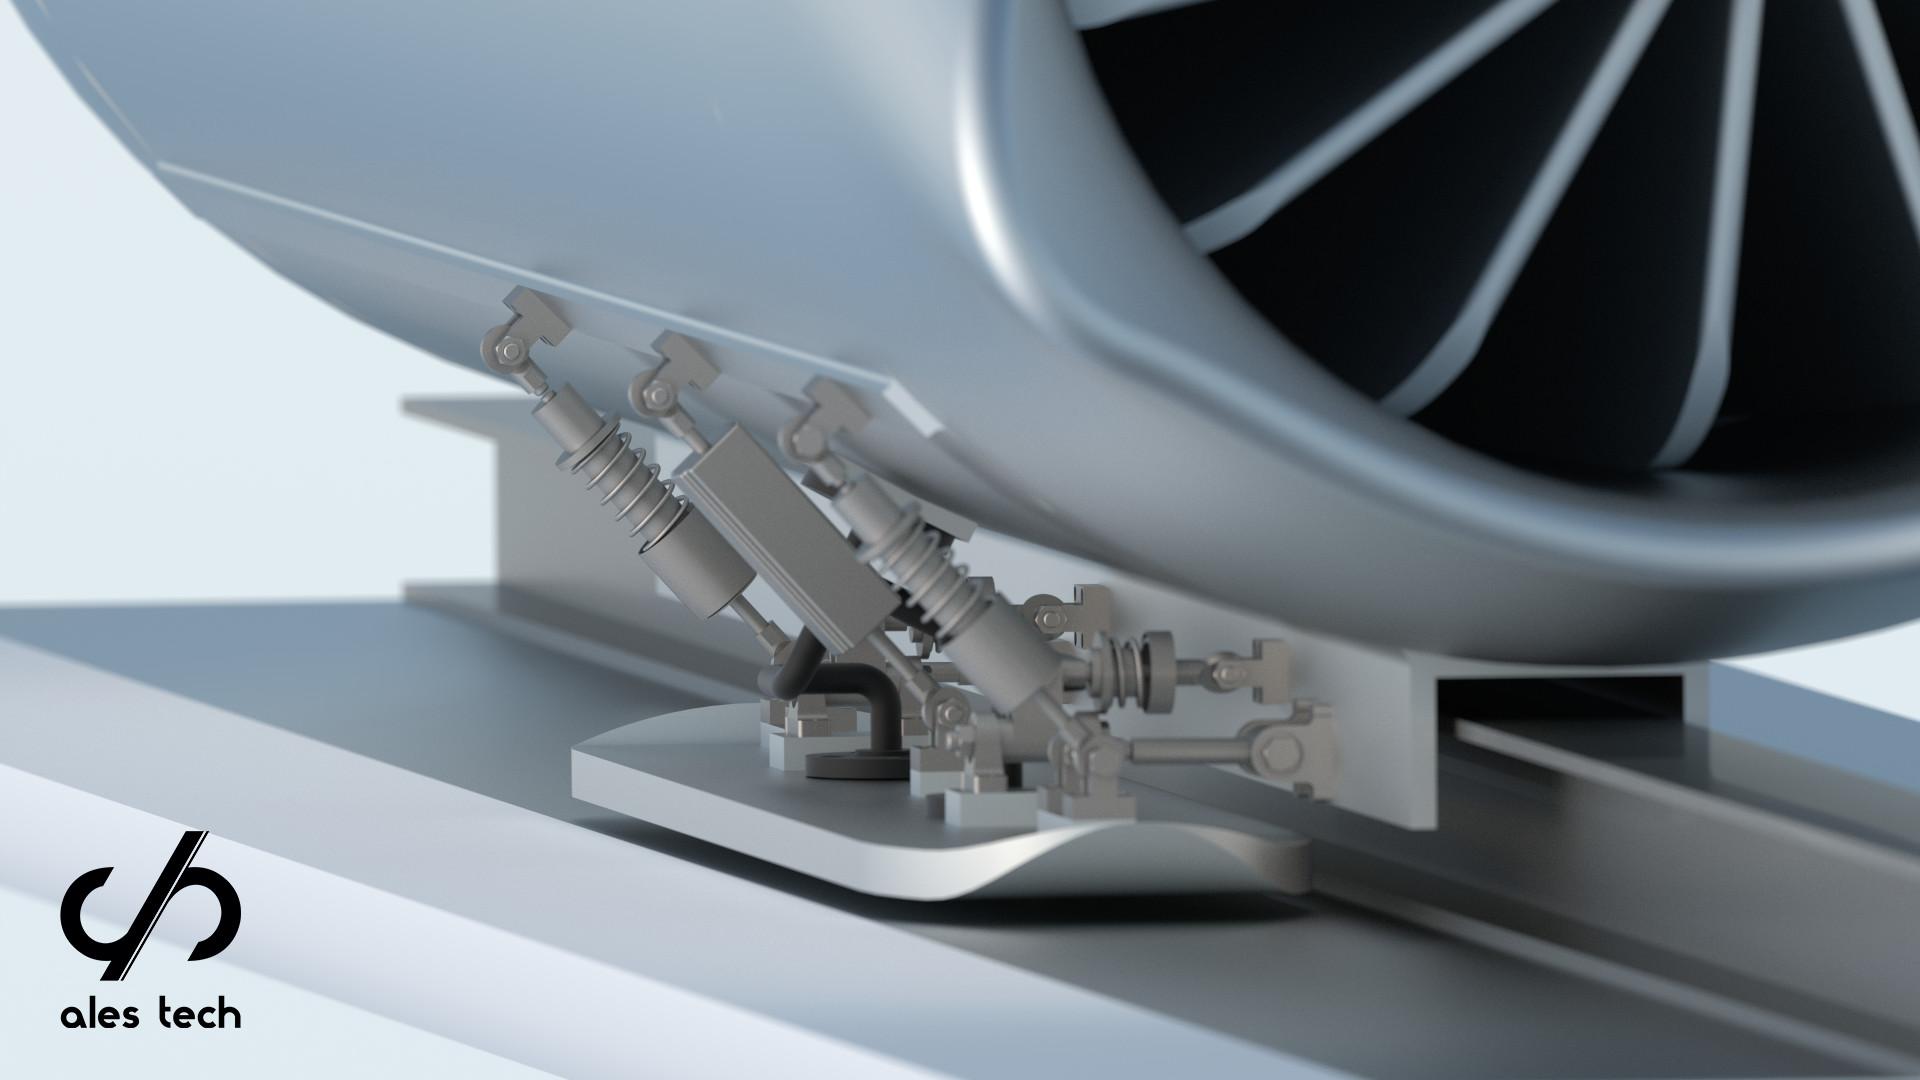 Ales Tech active suspension system - a preliminary concept